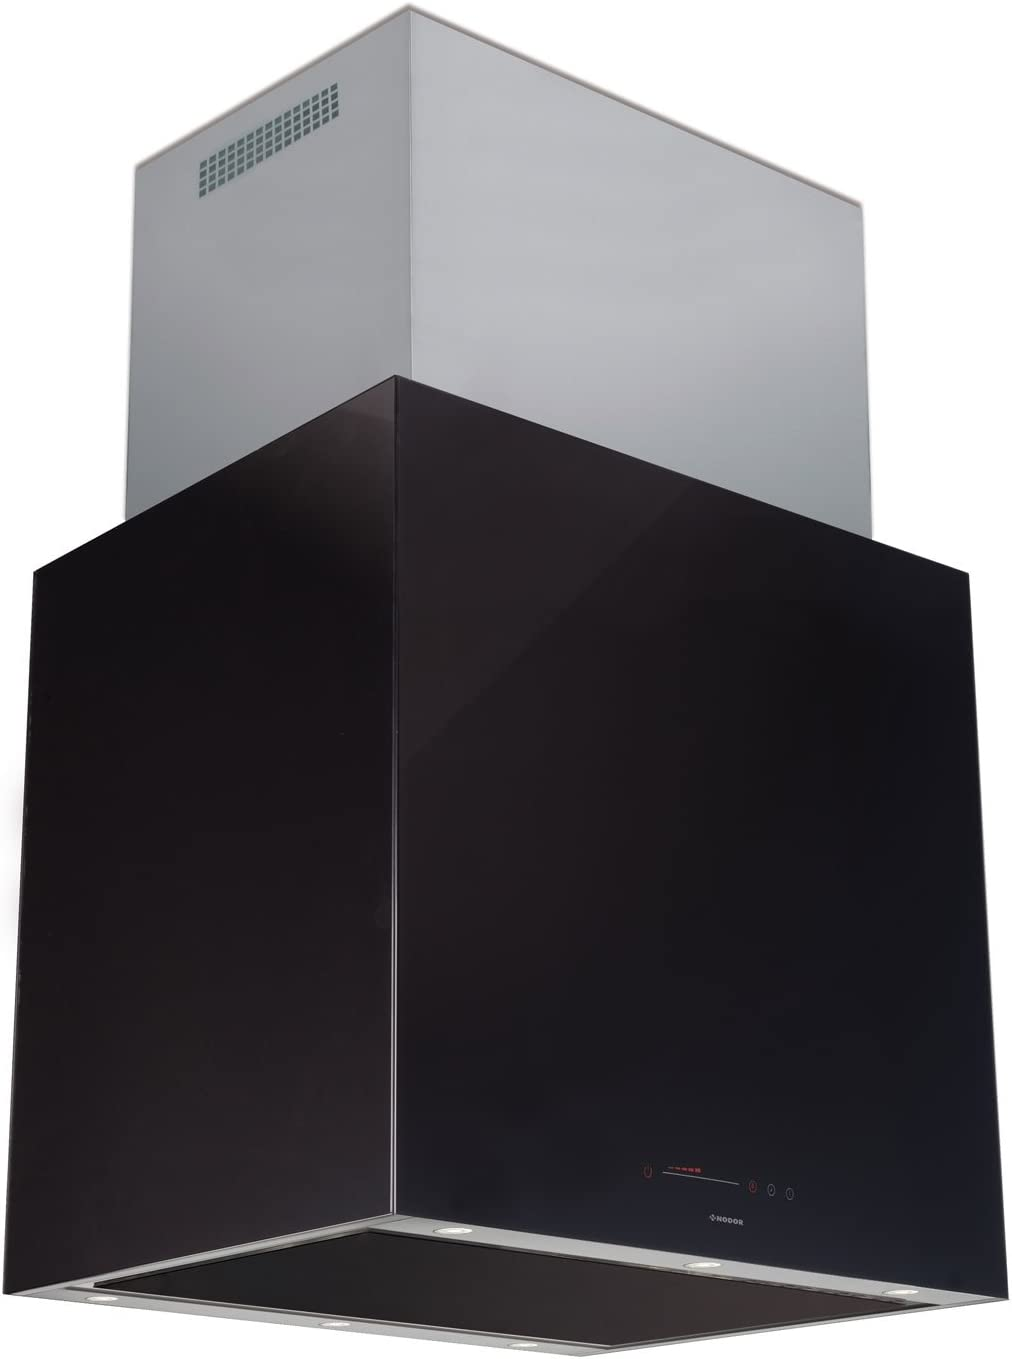 Nodor Isla Cube Glass Premium Isla Negro 740m³/h - Campana (740 m³/h, Canalizado, 33 dB, 59 dB, Isla, Negro): Amazon.es: Hogar